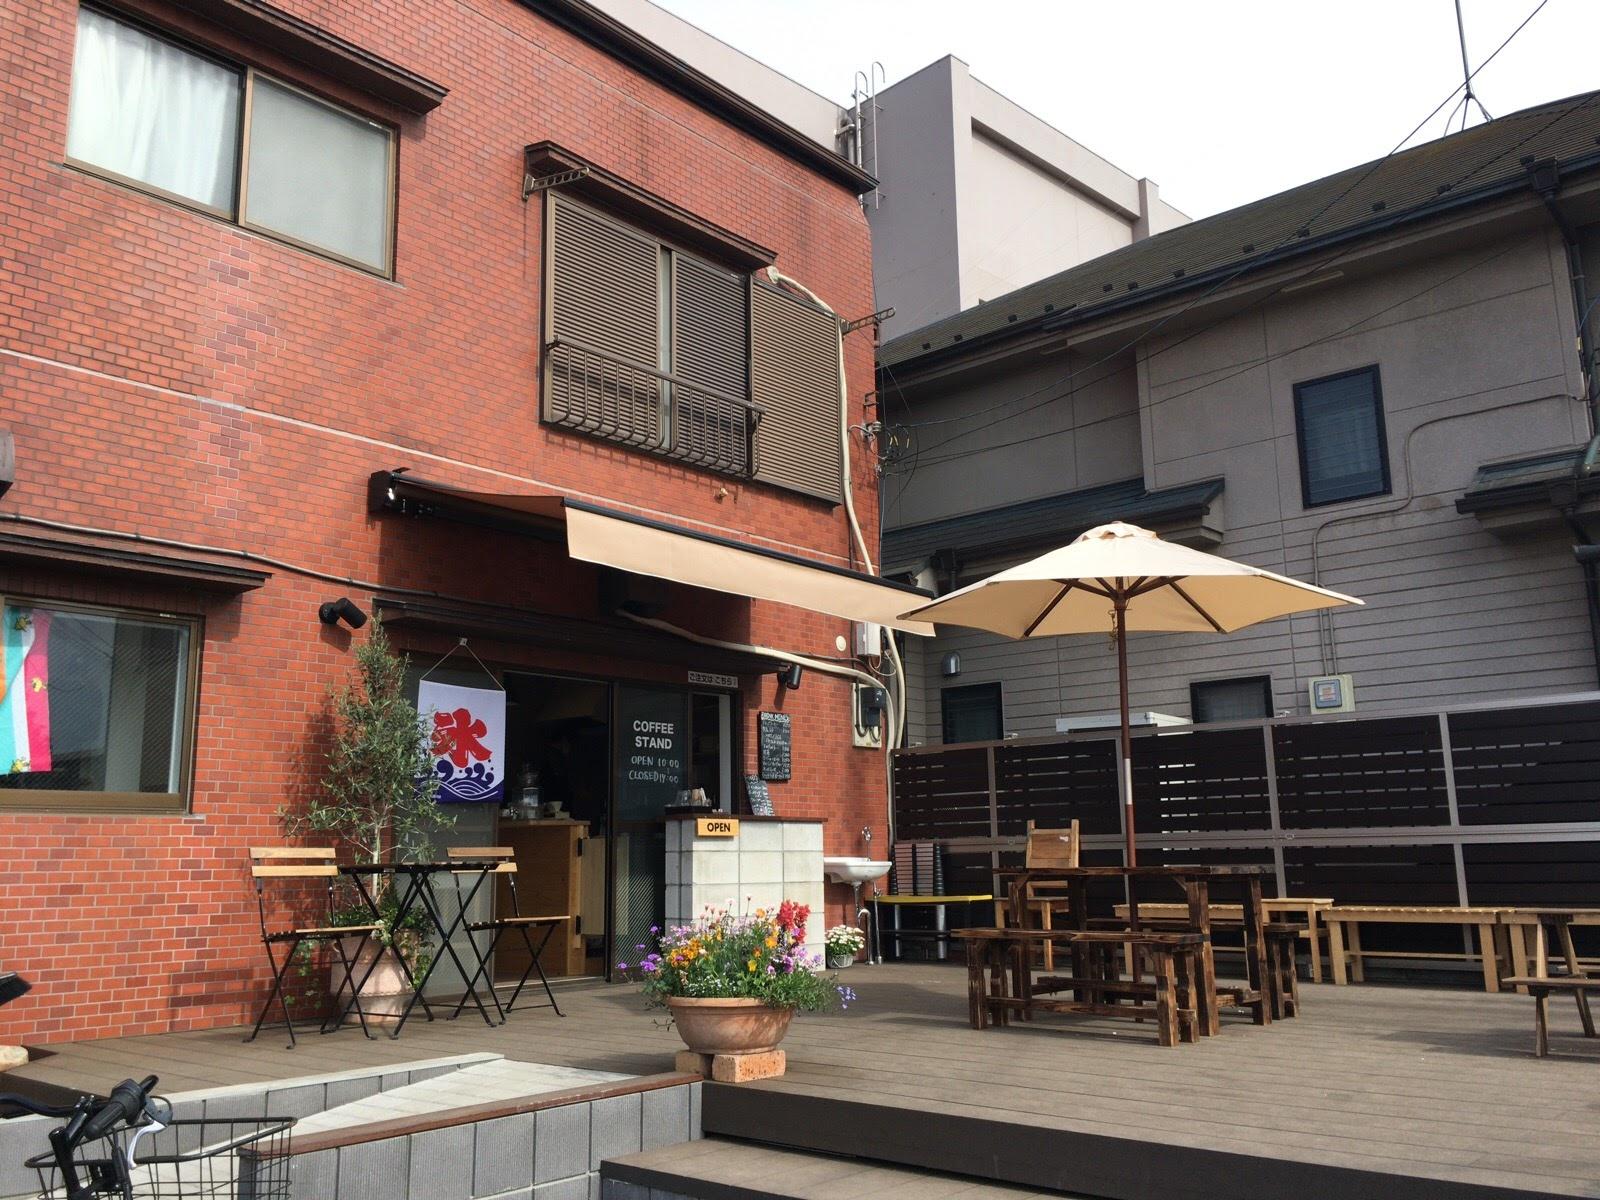 22jTERRACE つつじテラス | 東久留米・黒目川沿いに「駄菓子屋・カフェ・雑貨屋」のお店が誕生、オープンテラスが気持ちいい♪